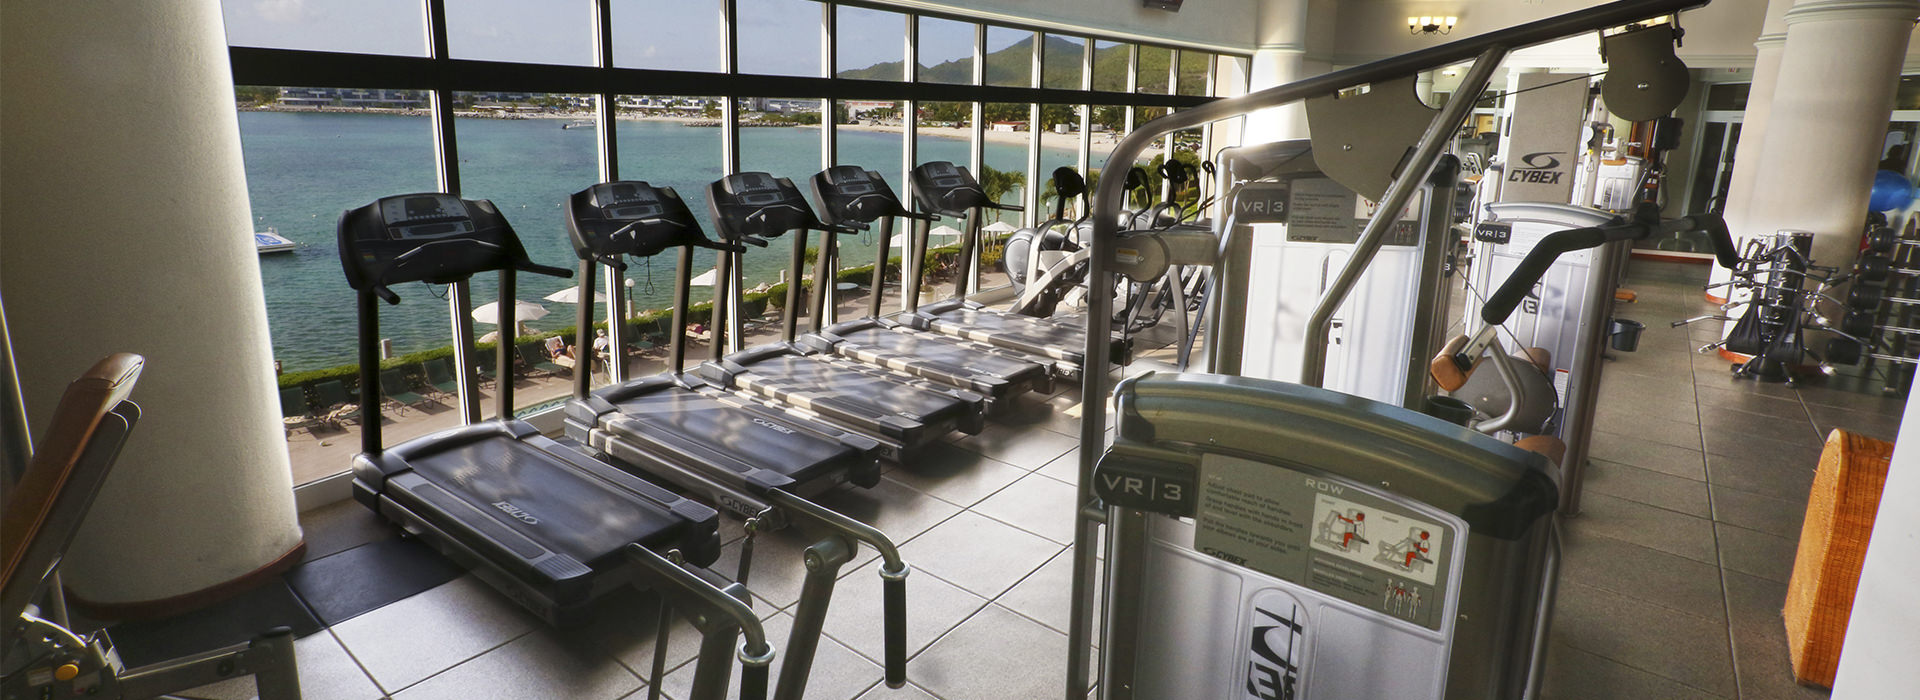 st maarten gym